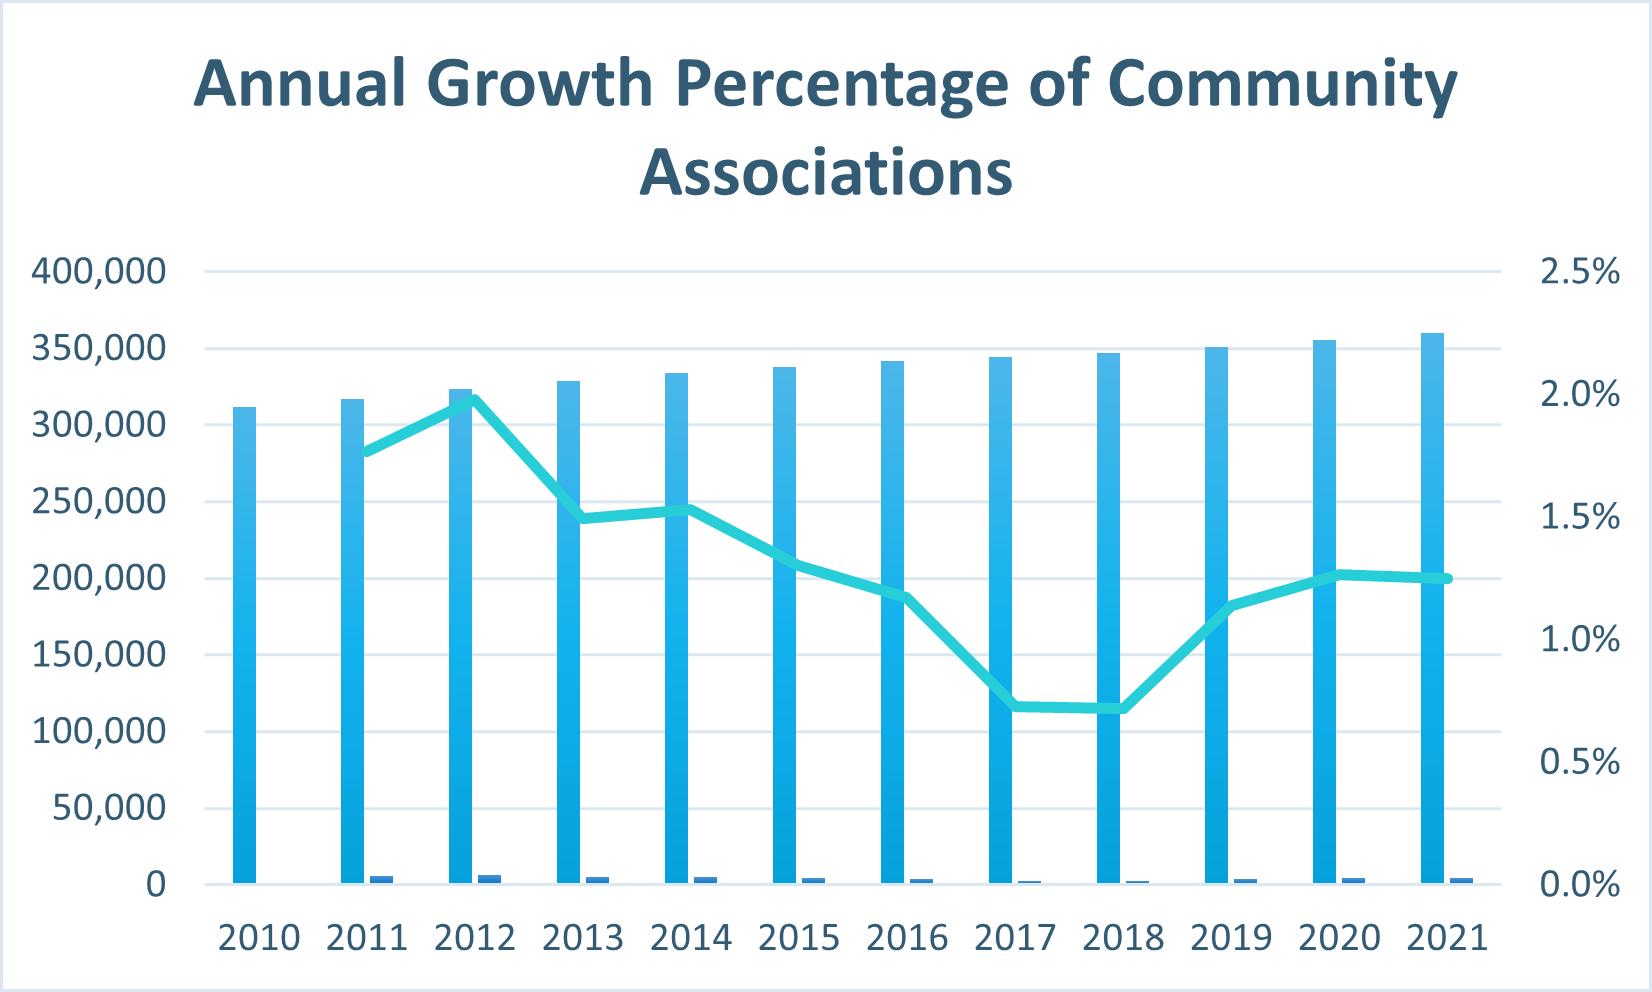 Annual Growth Percentage of Community Associations